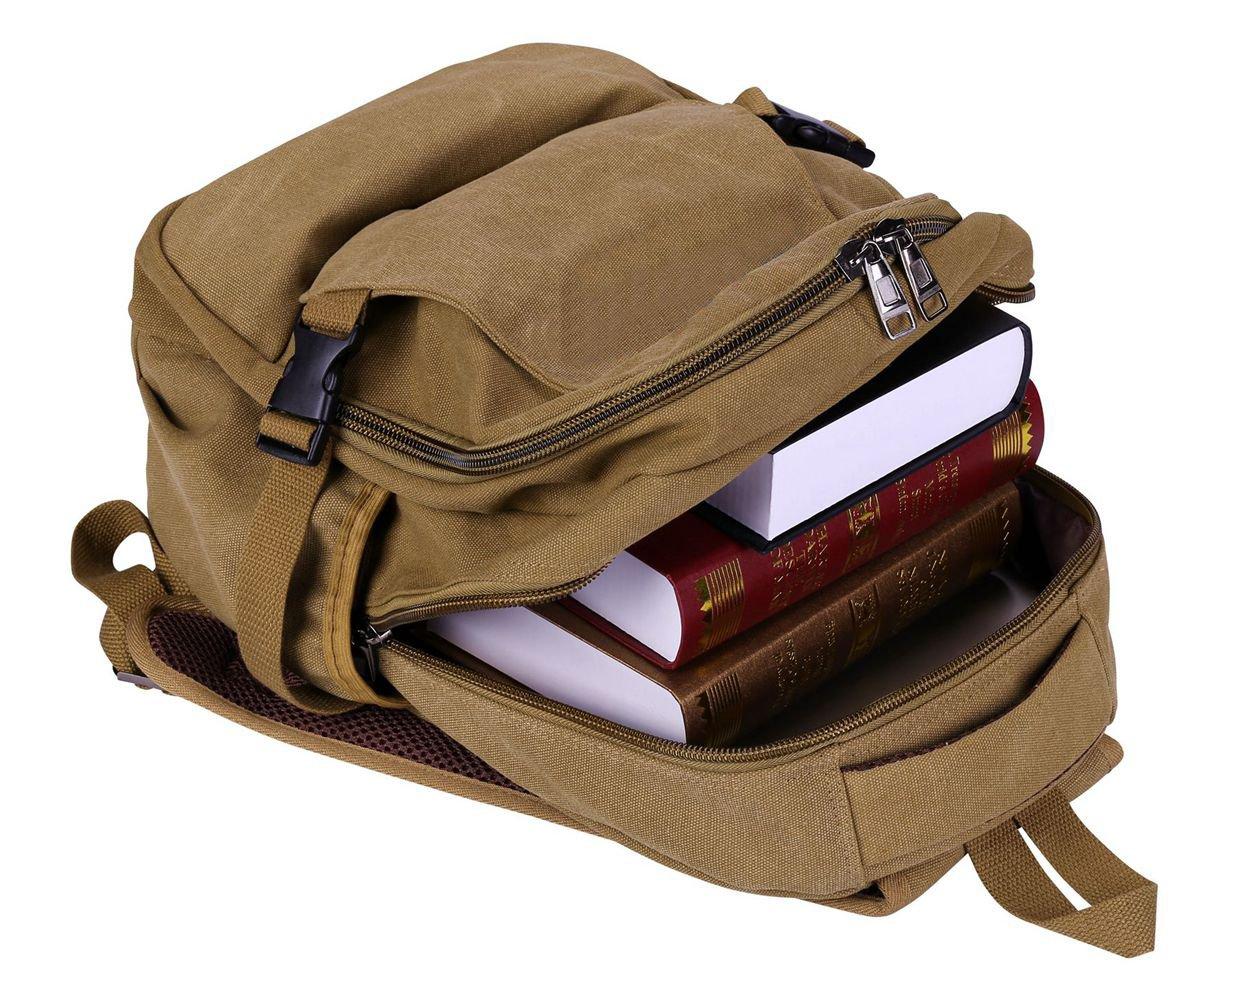 Laptop Backpack,VIDENG Business Canvas Handbags Bookbag for College Travel Backpack for Under 15 17 Inch Laptop (BCS-Brown) by VIDENG (Image #3)